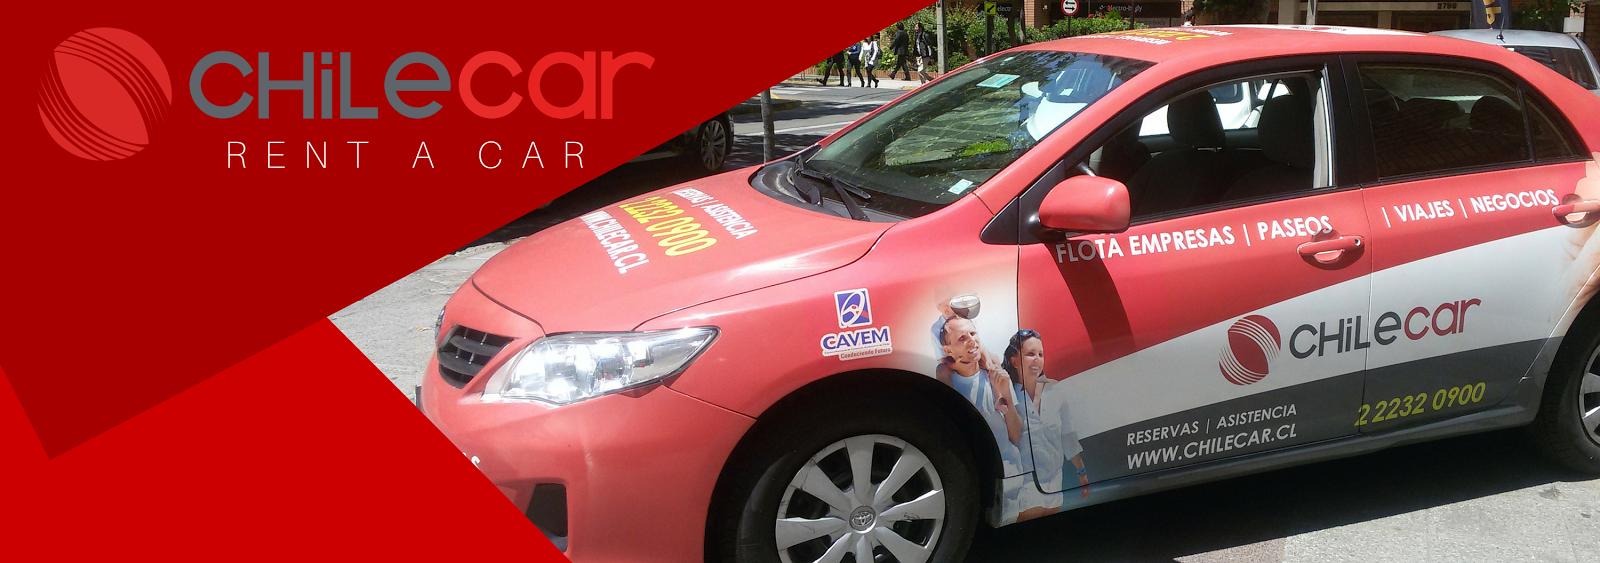 Chile Car, rent a car